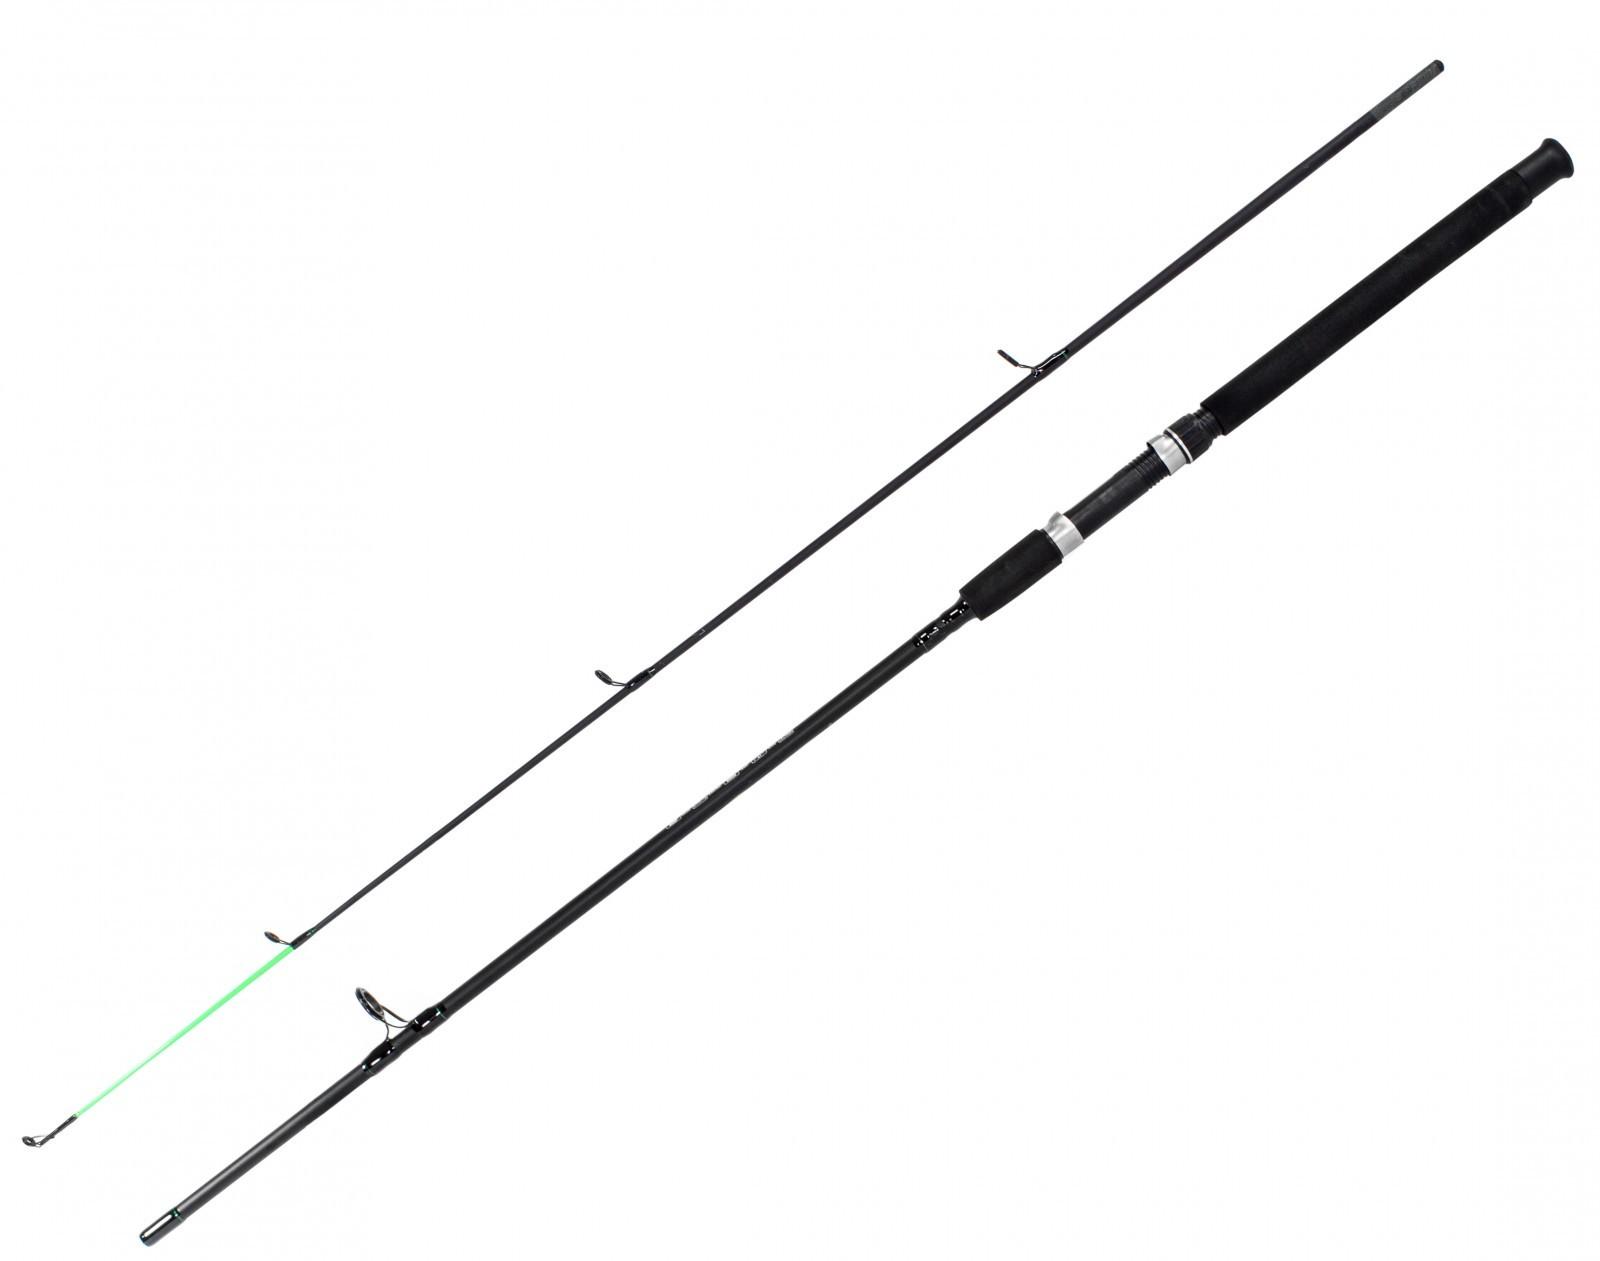 Cпиннинг штек. Mifine Assault 2.4 м / 10-40г / арт 1106-240